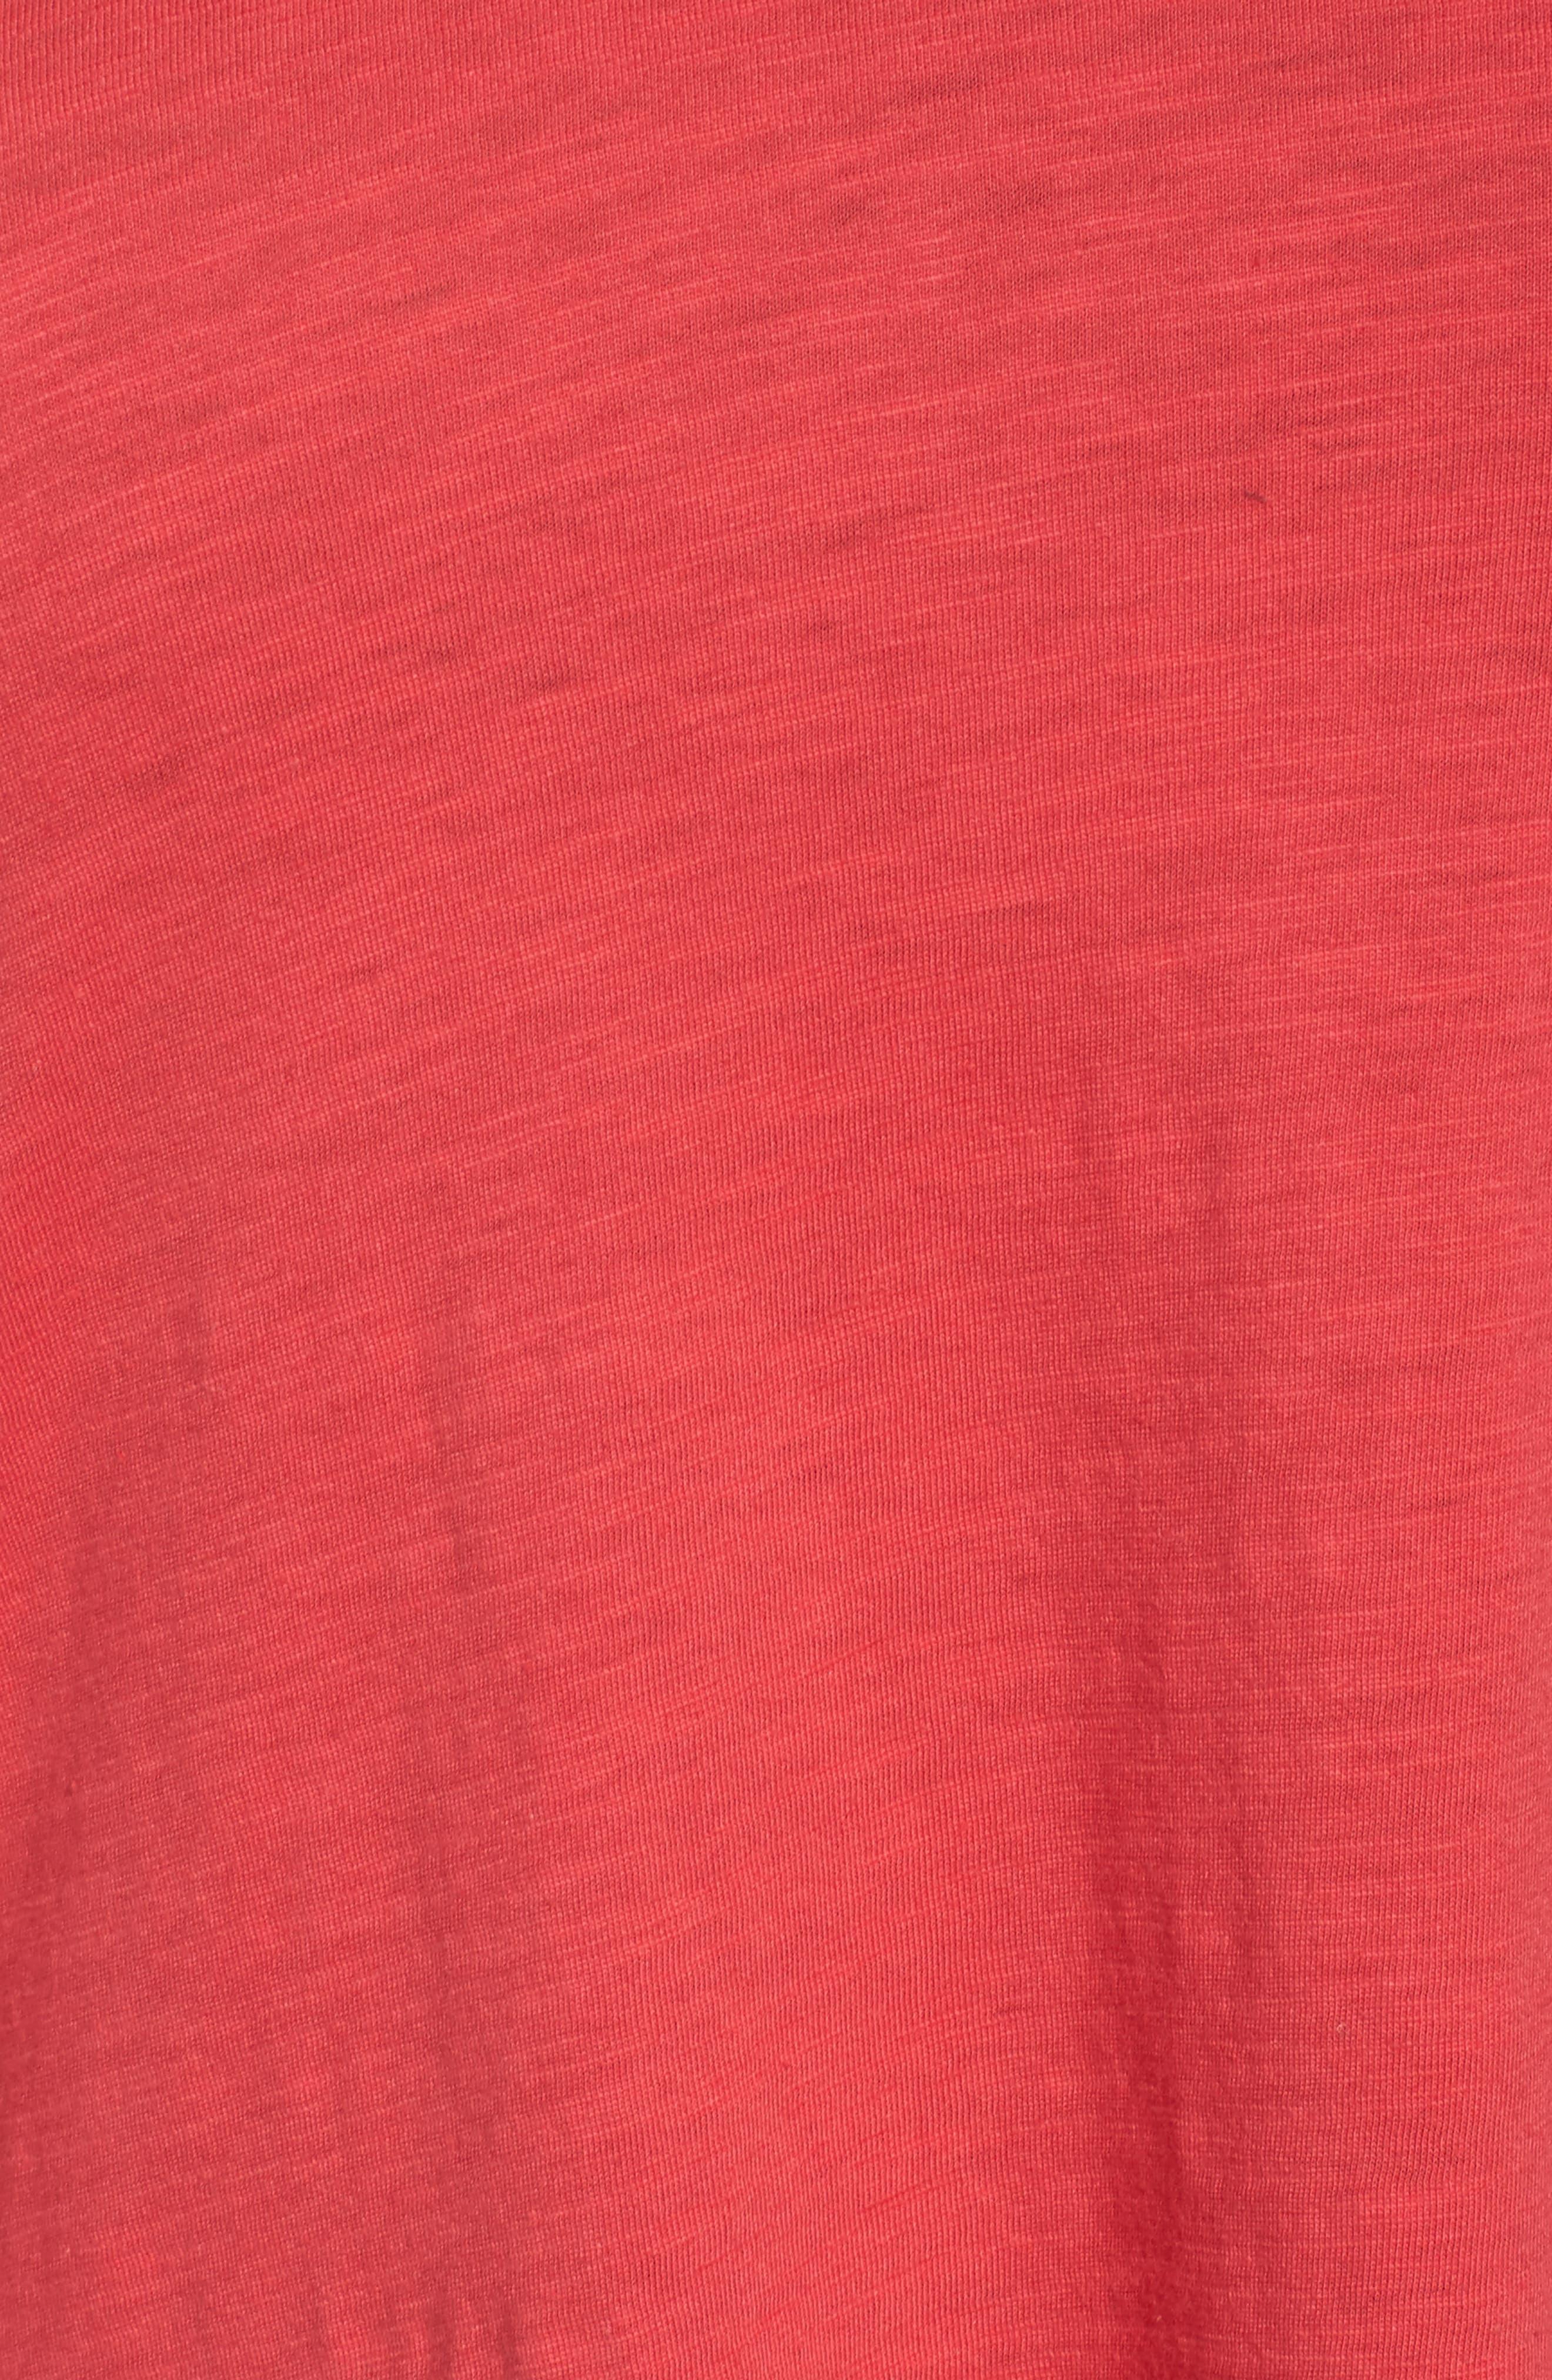 Organic Cotton V-Neck Top,                             Alternate thumbnail 35, color,